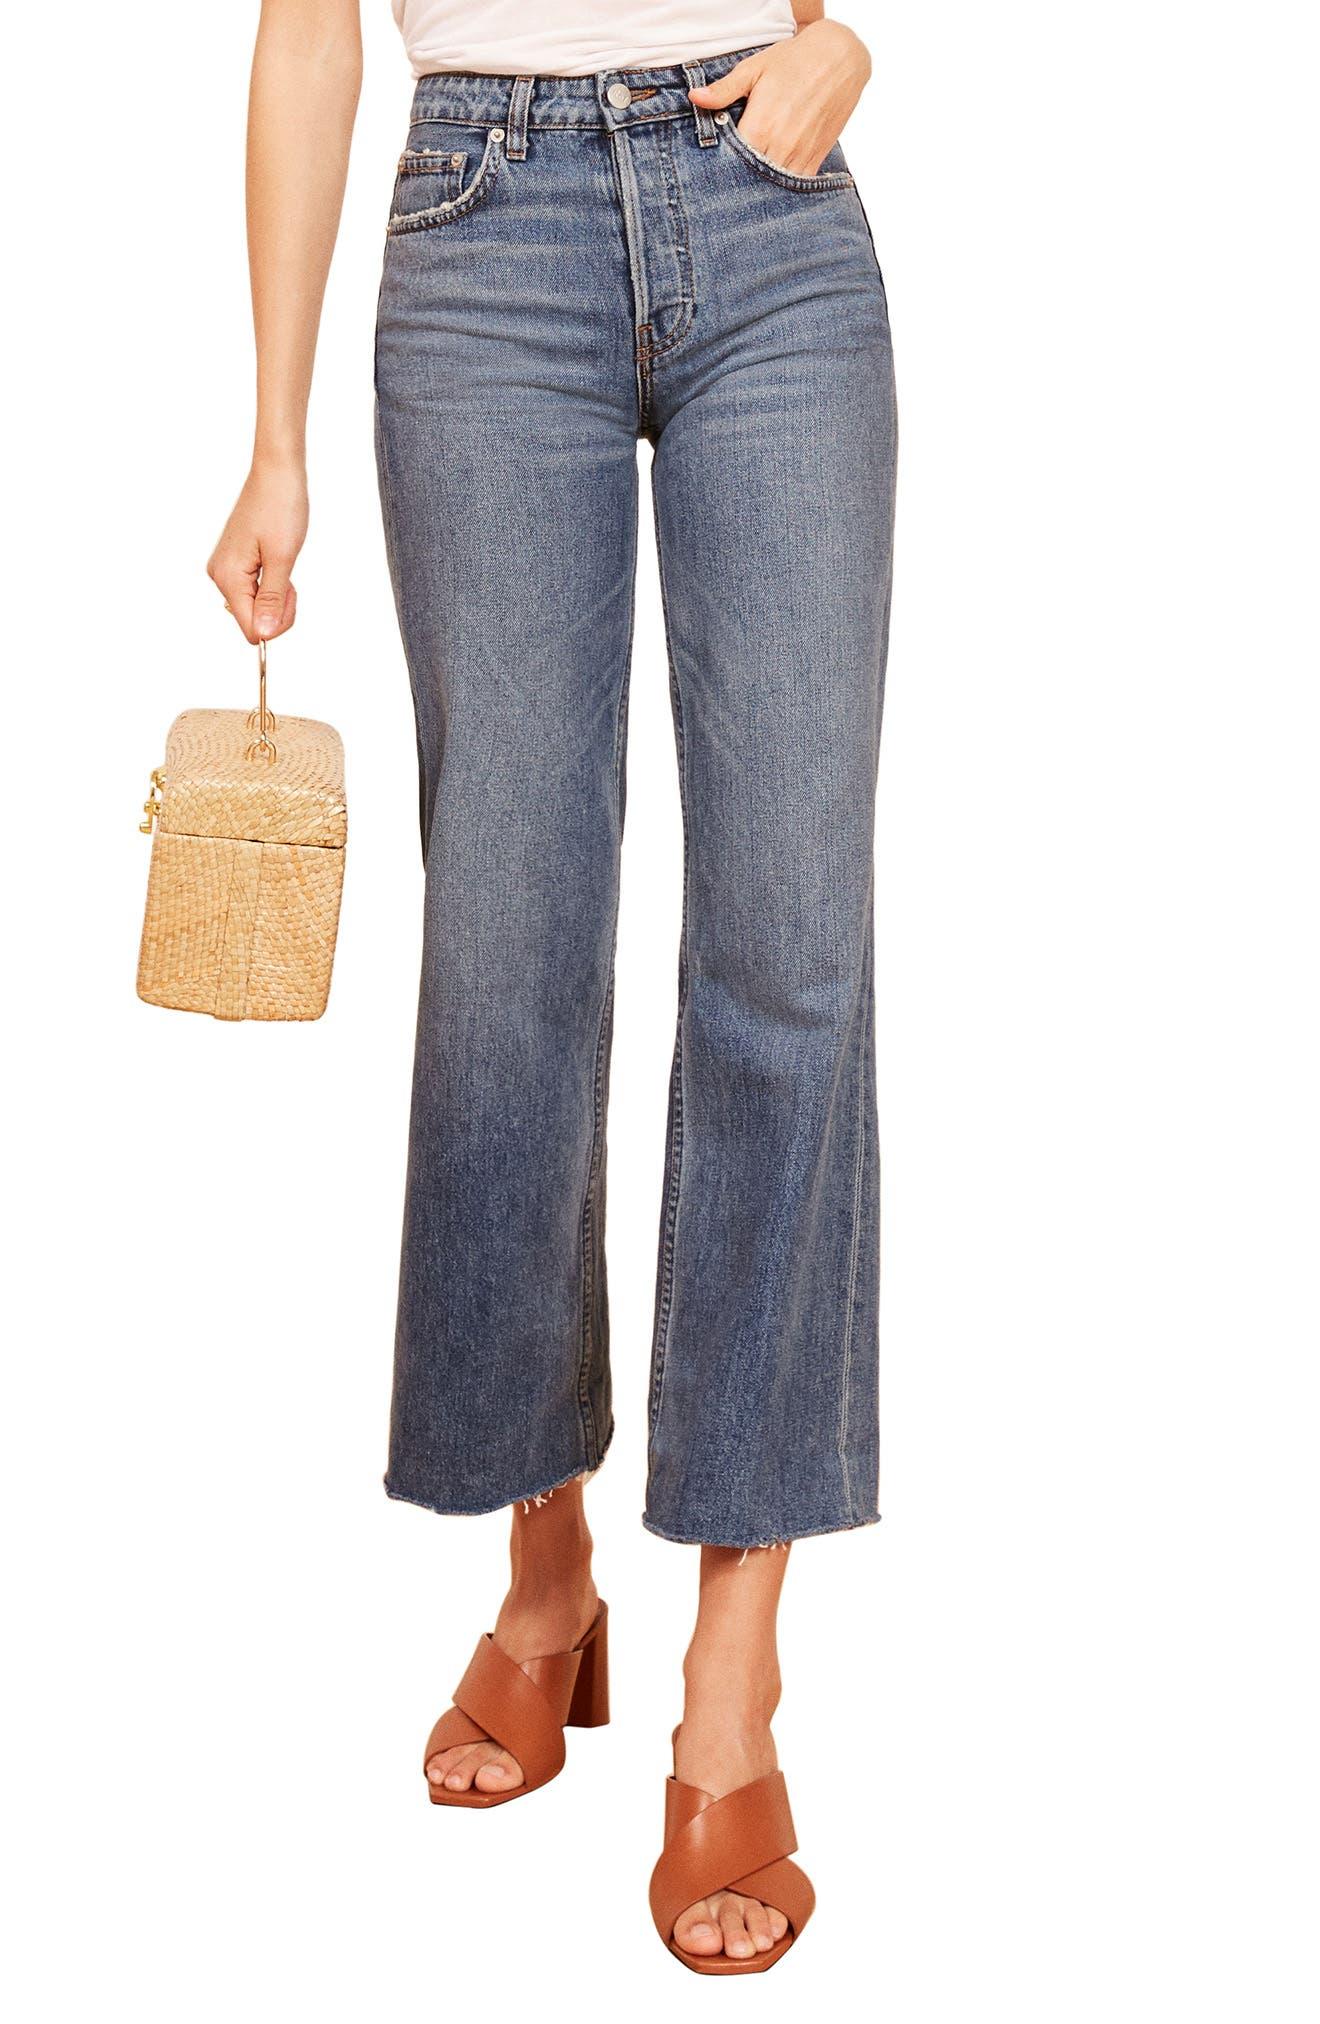 REFORMATION, Fawcett High Waist Crop Jeans, Main thumbnail 1, color, CELTIC